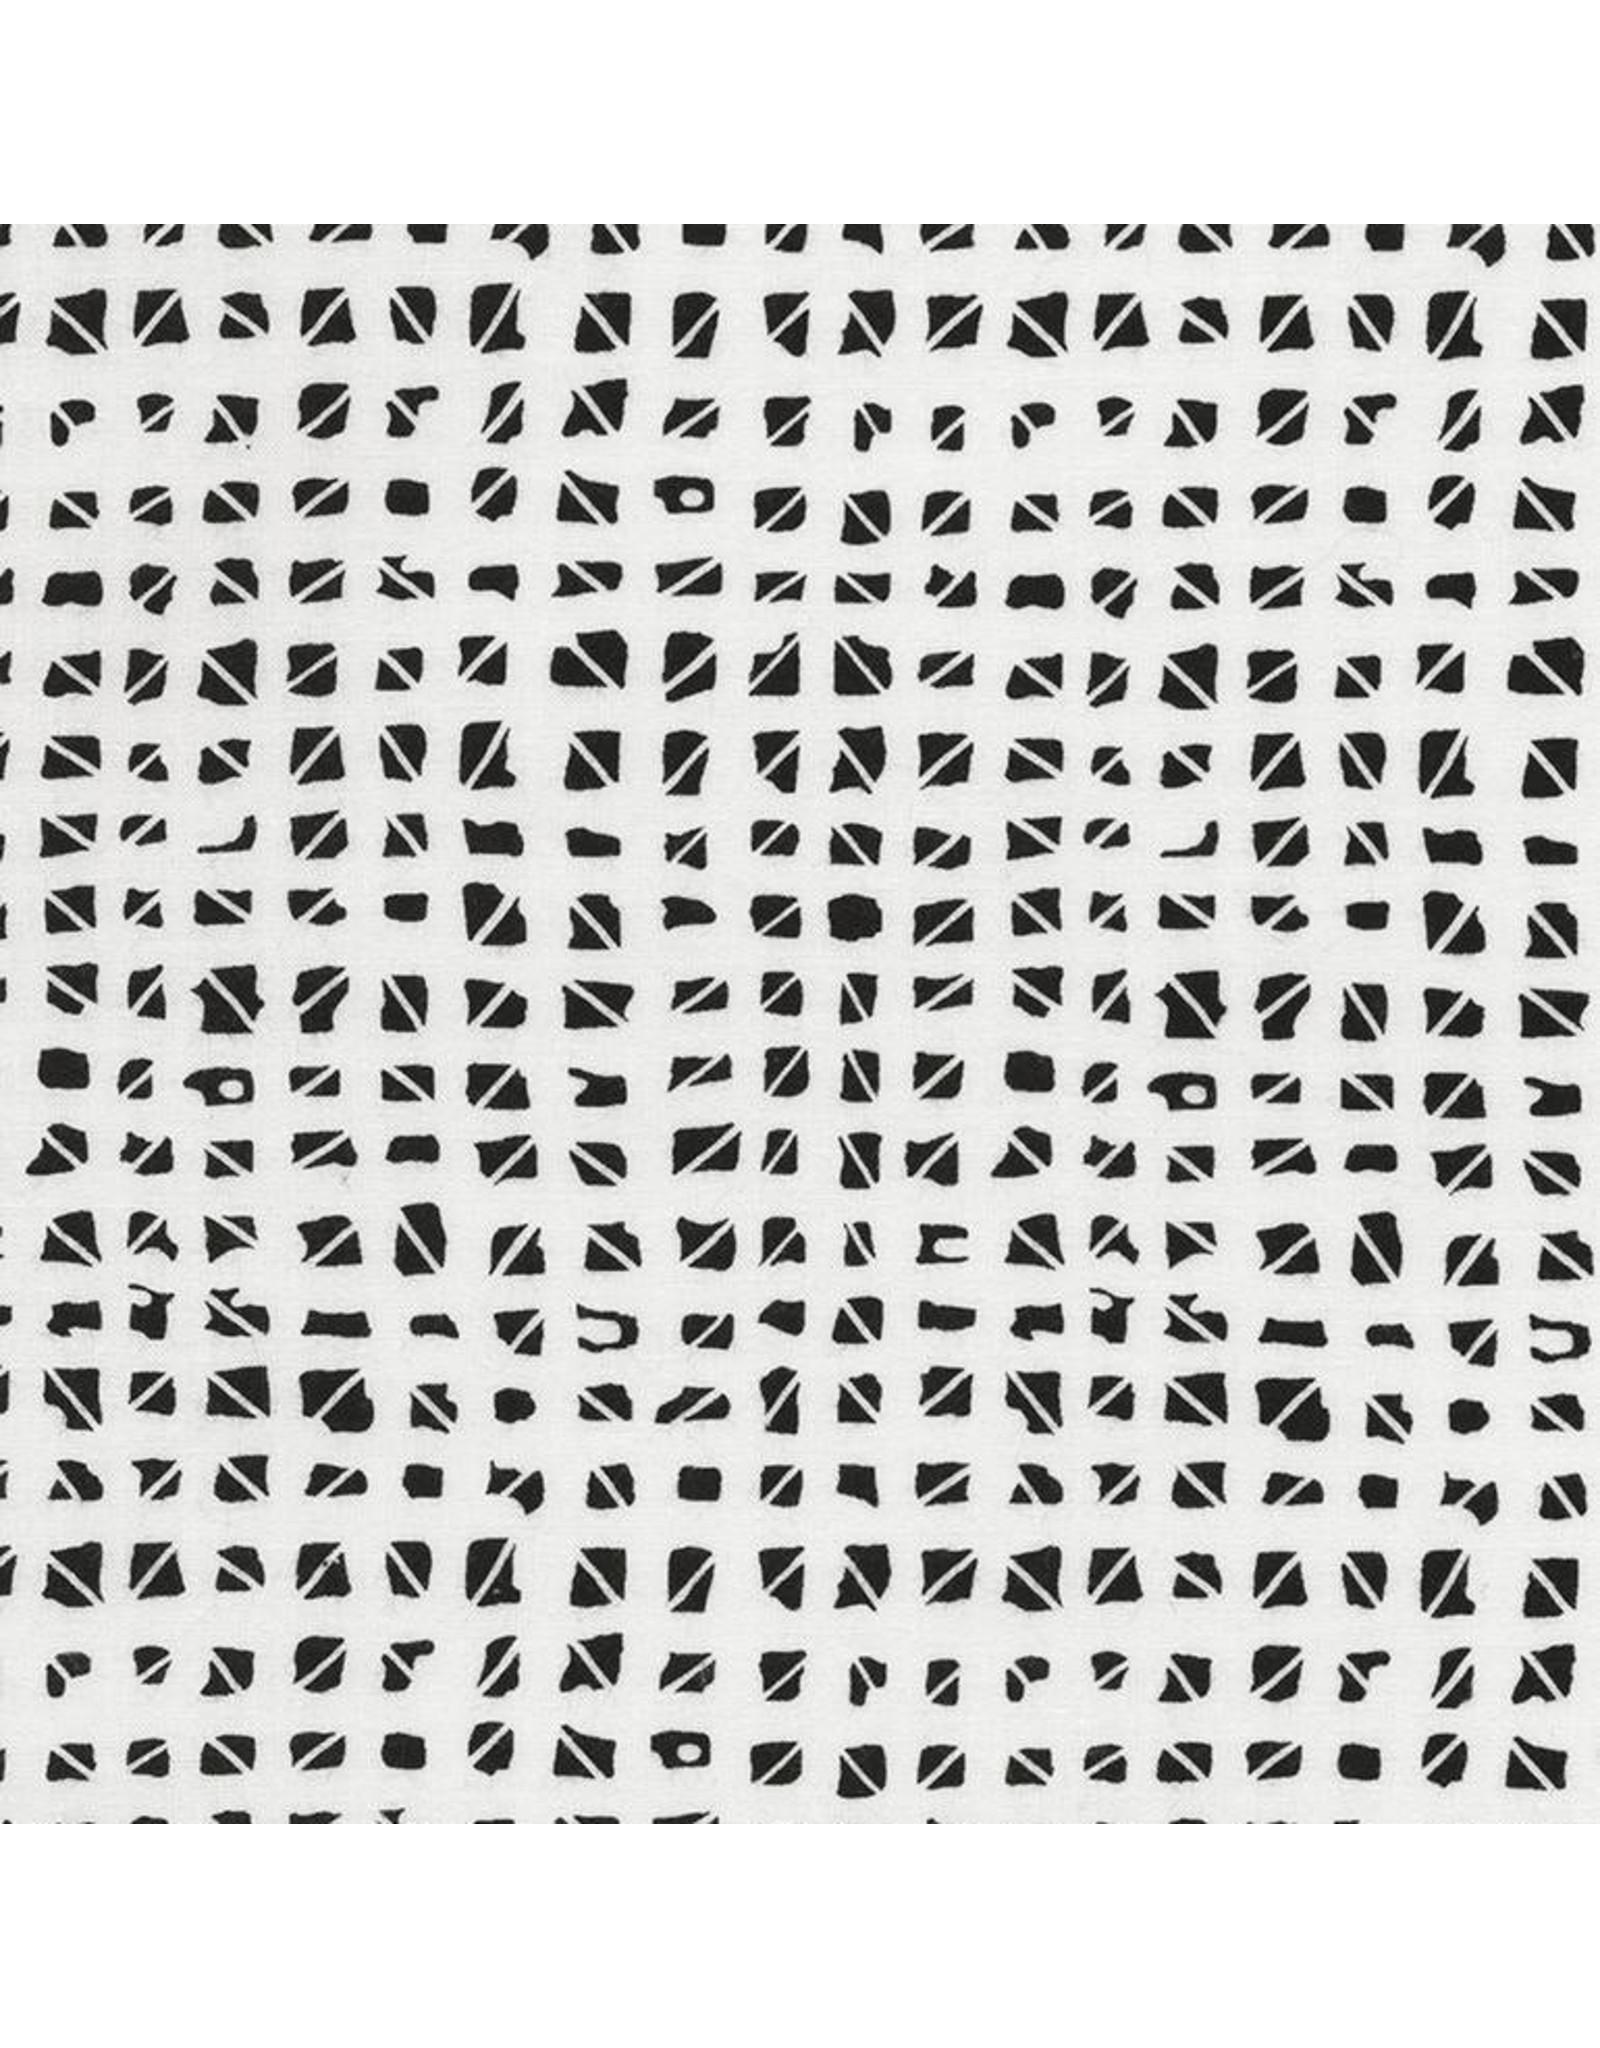 Timeless Treasures Kinfolk - Small Blocks White coupon (± 15 x 110 cm)